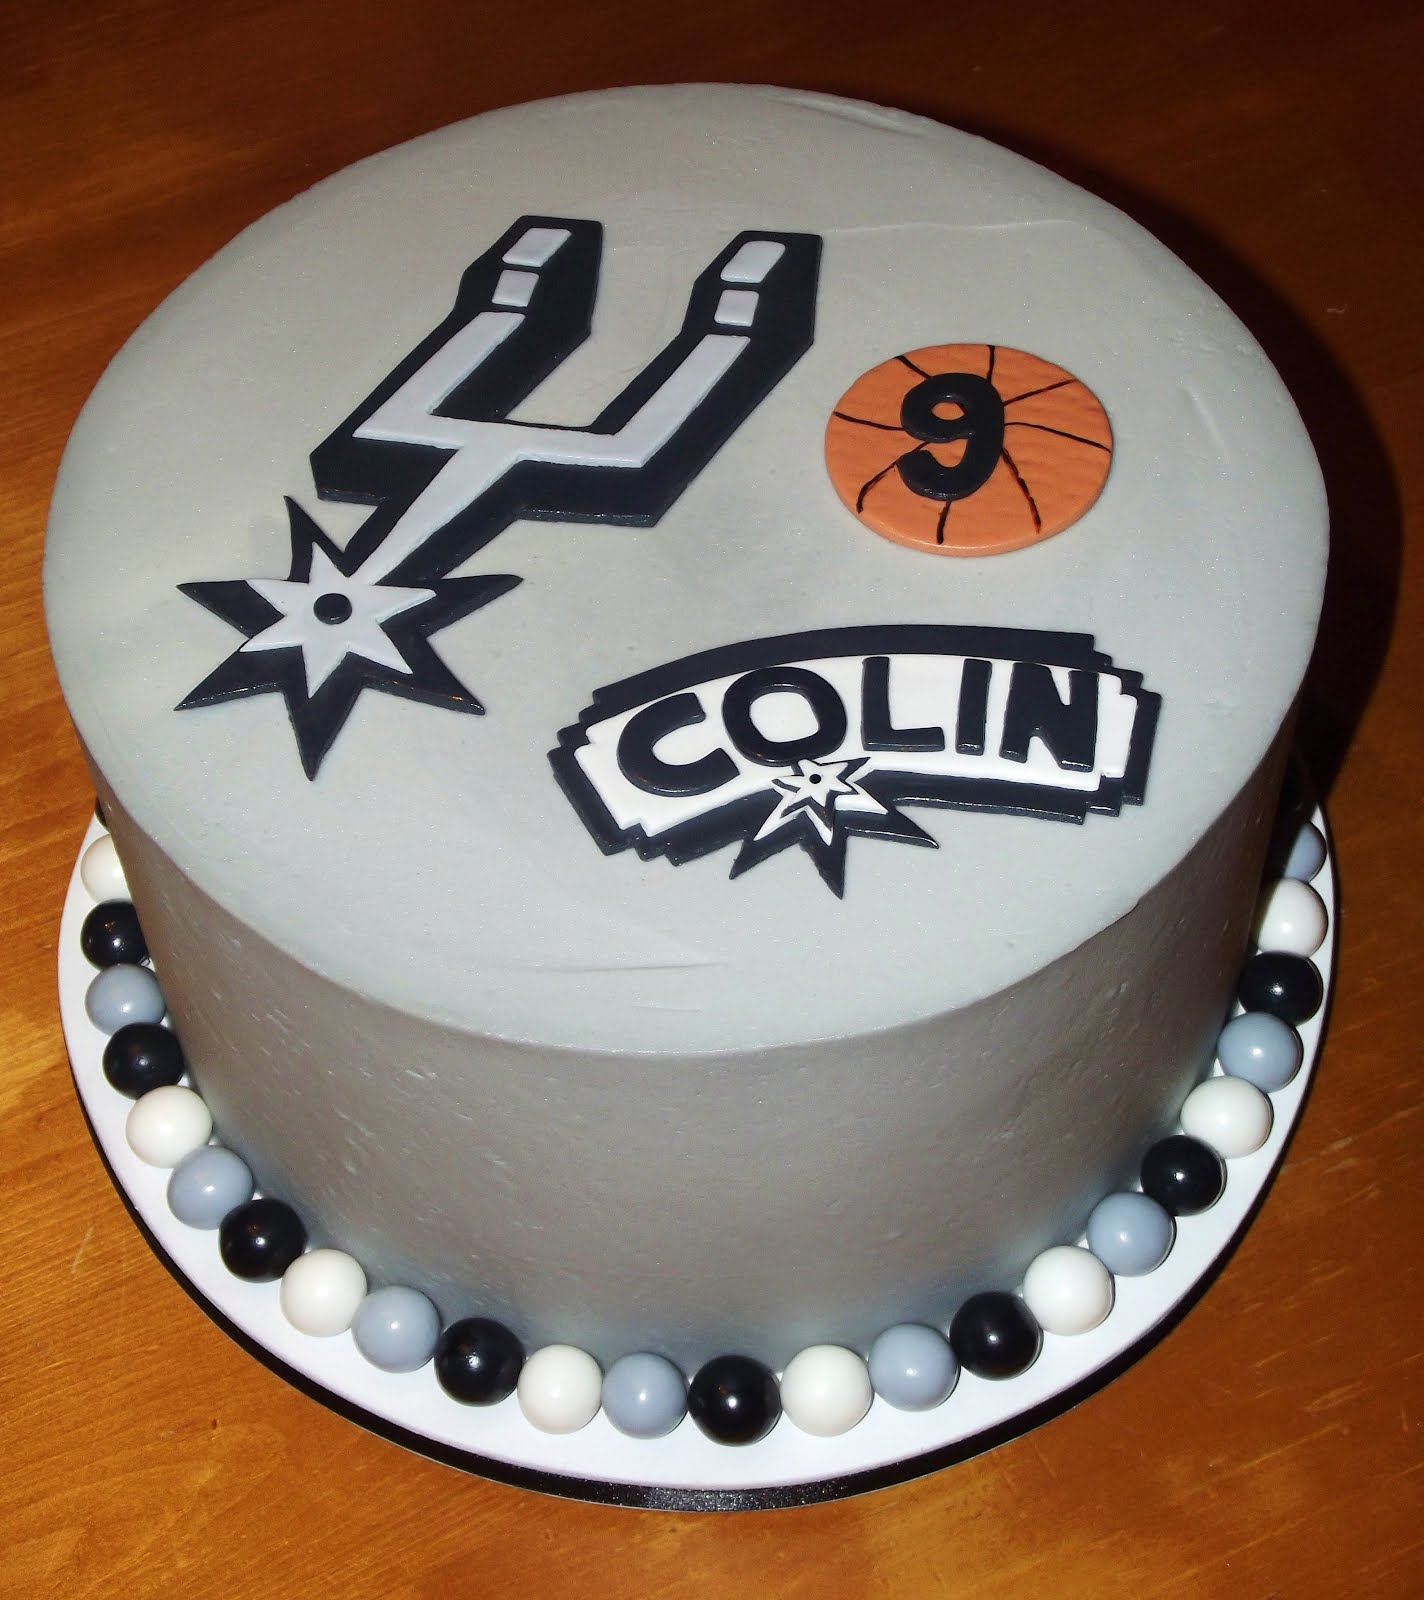 Astounding 10 Custom Birthday Cakes San Antonio Photo Birds Bakery Cakes Funny Birthday Cards Online Overcheapnameinfo